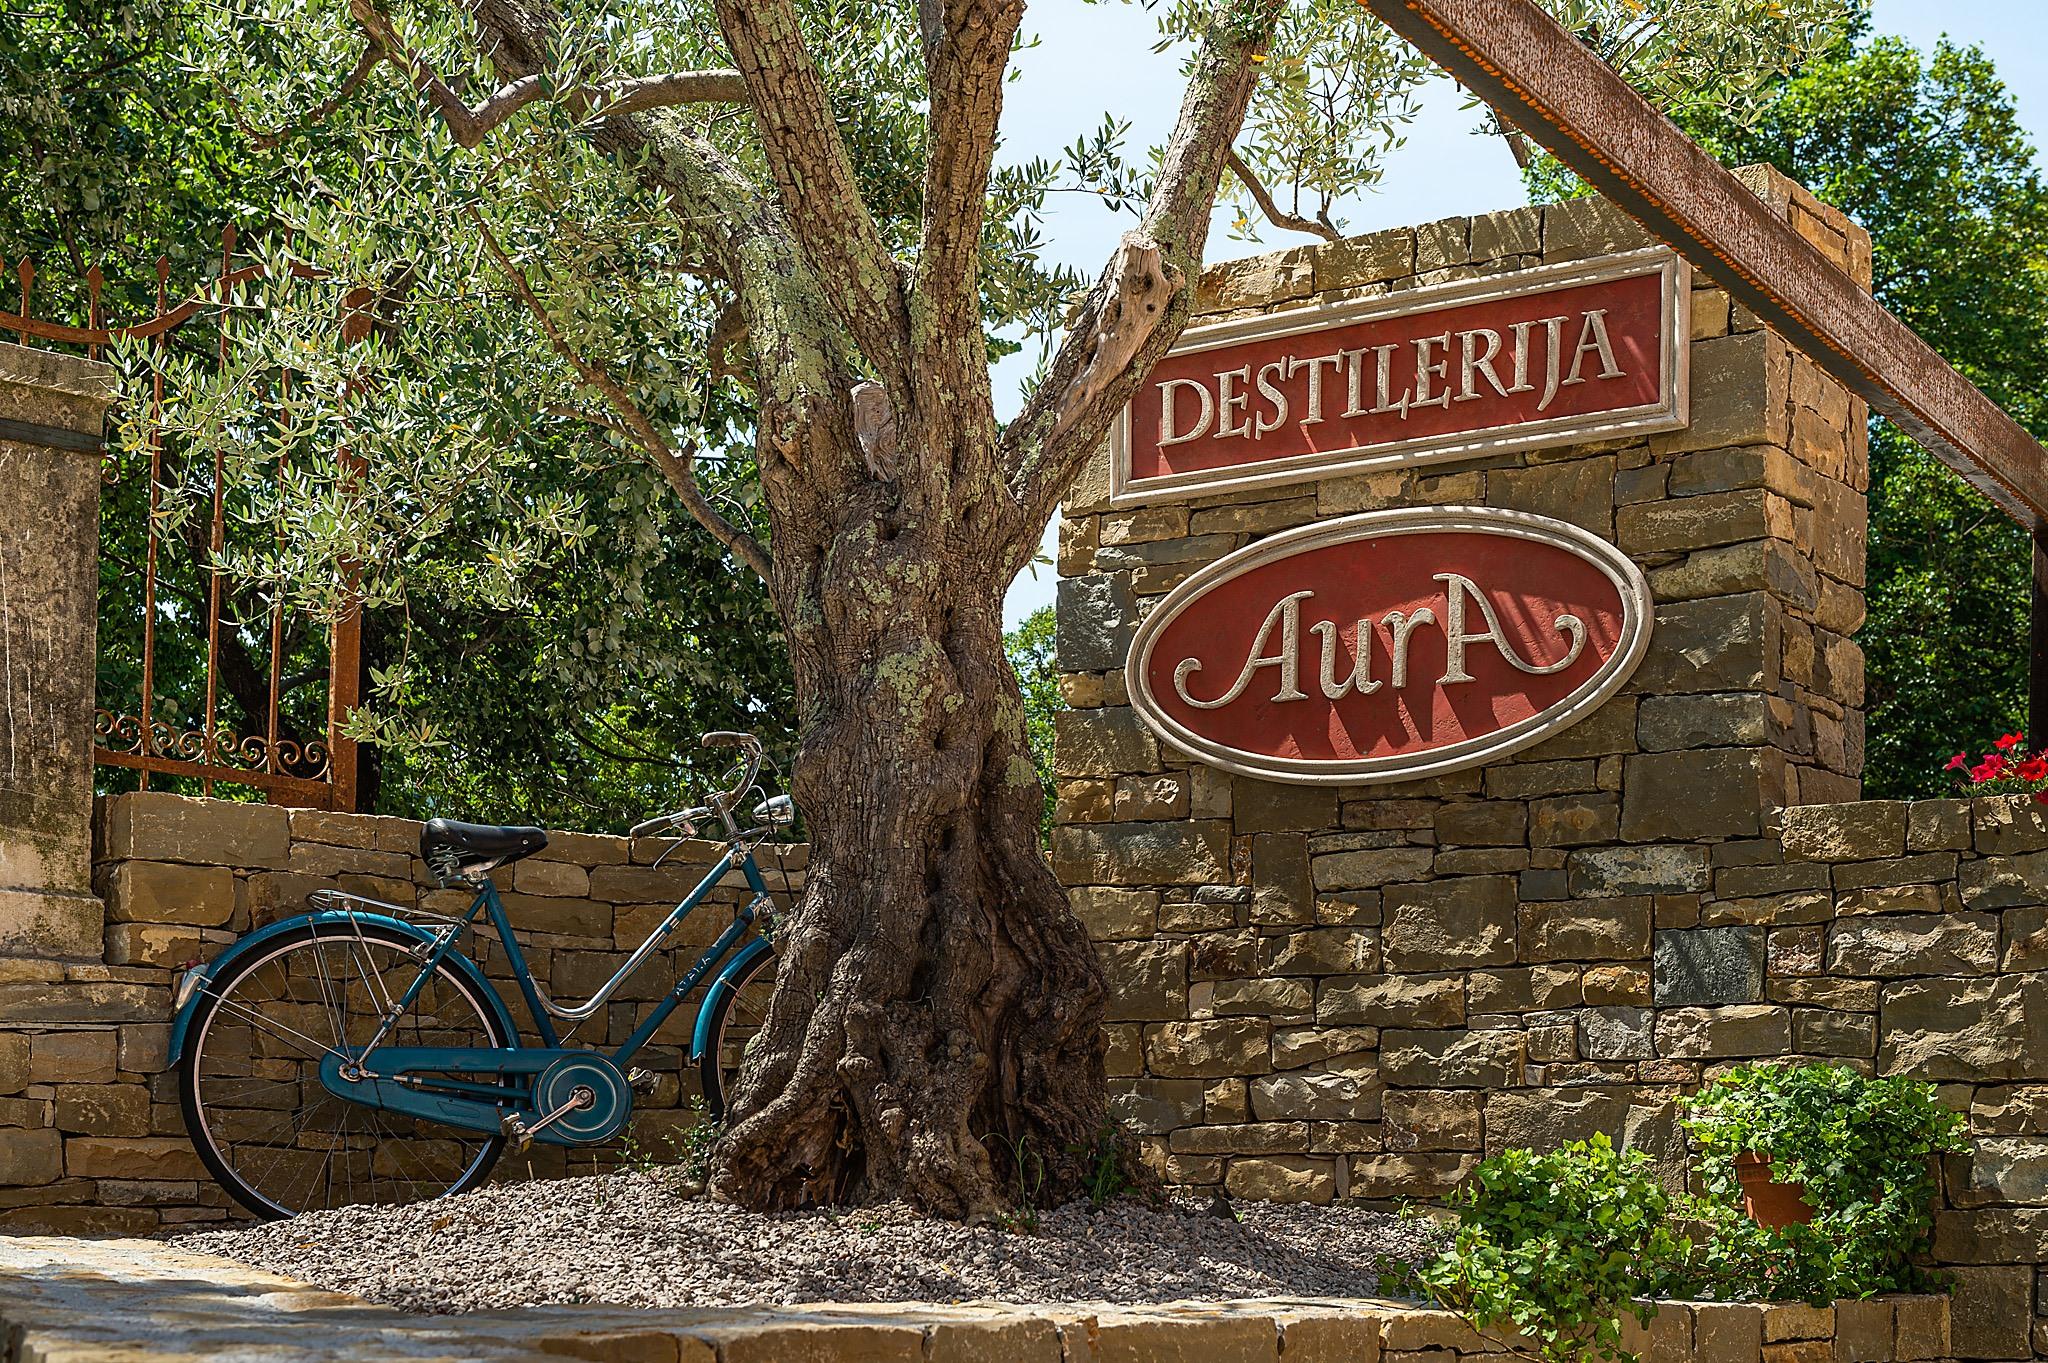 Aura Brennerei Destillerie aussen